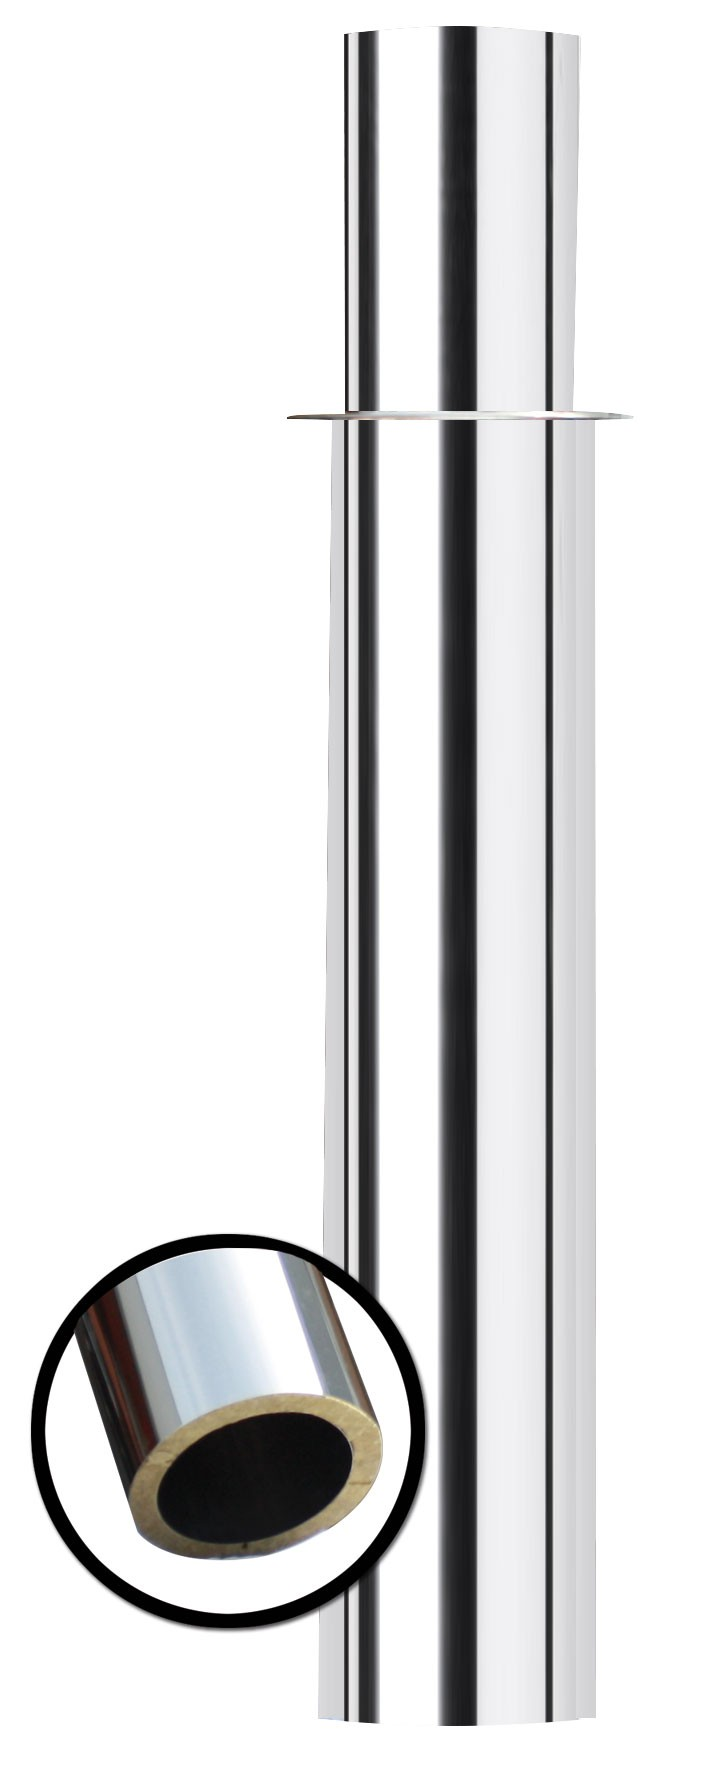 Verlängerungselement Edelstahl ohne Windkat 700mm Ø 160 mm Bild 1